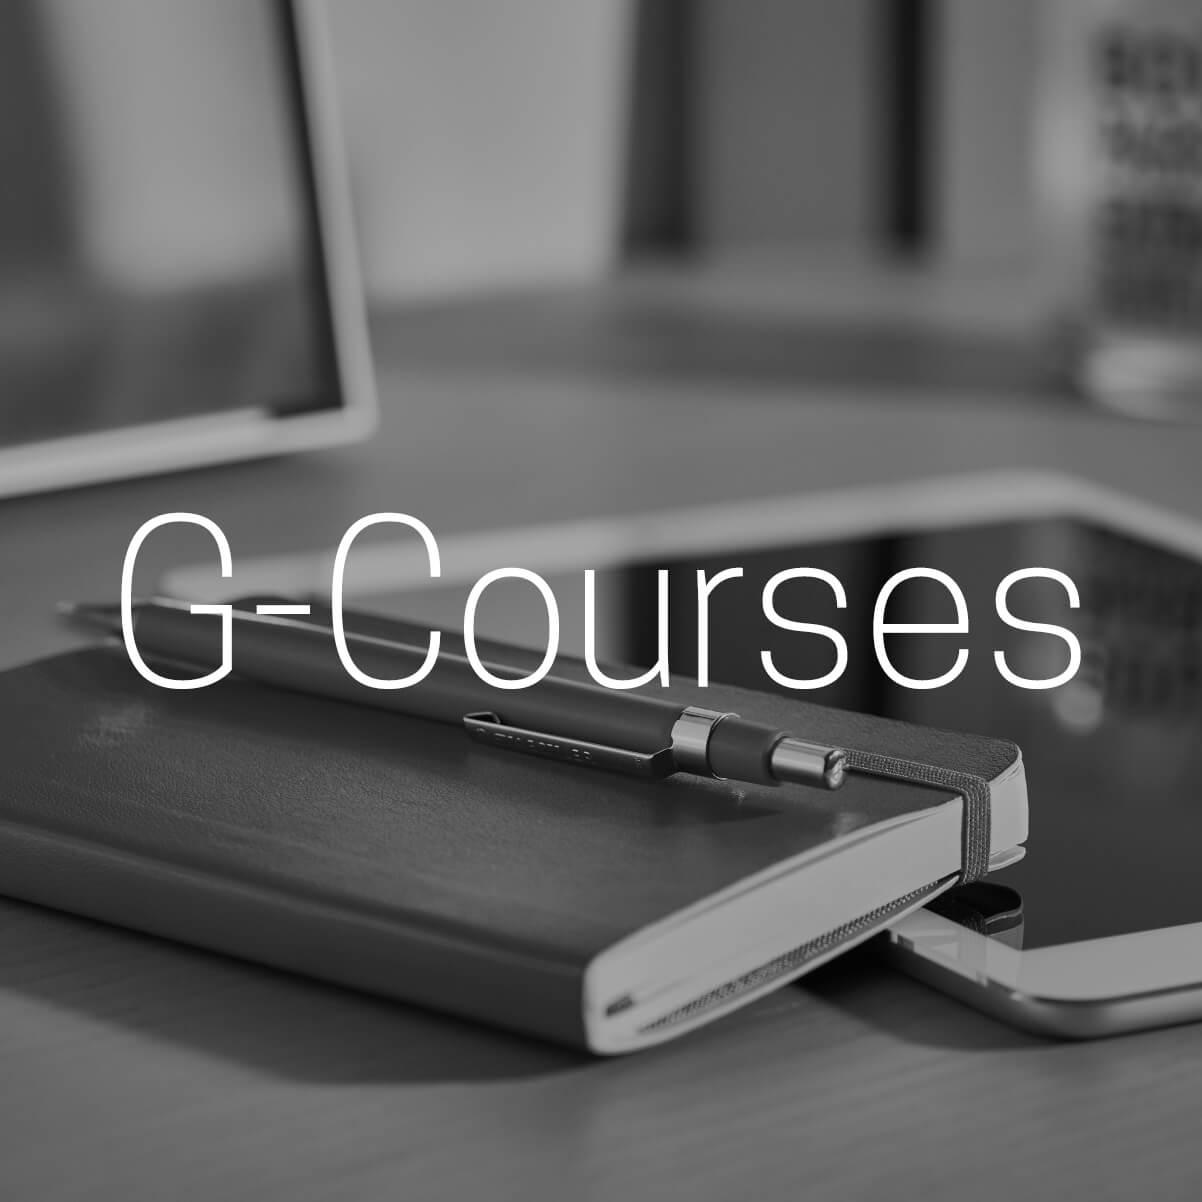 G-Courses